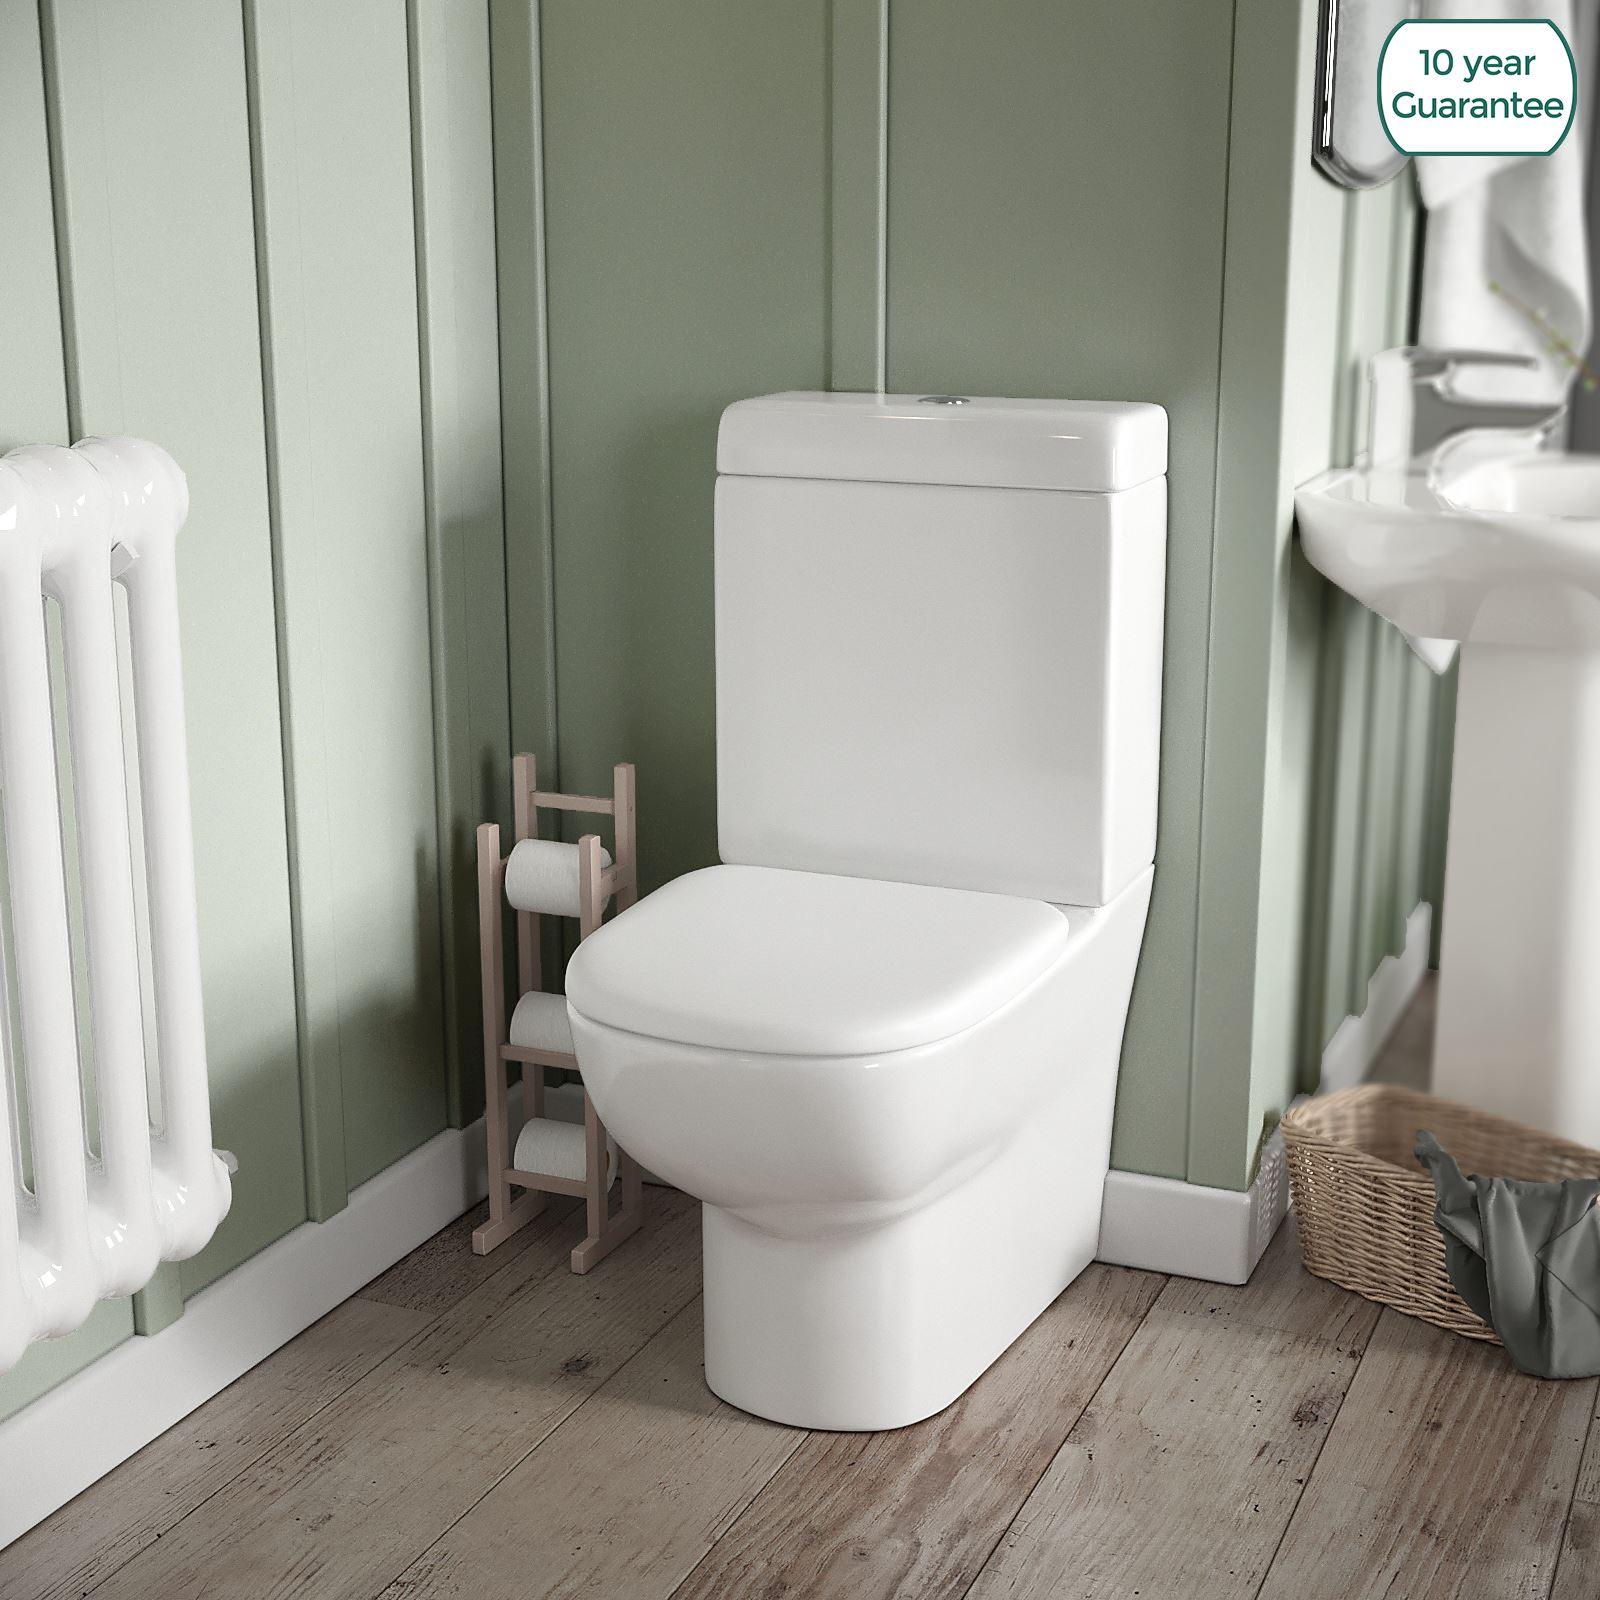 Excellent Details About Linnsdale Bathroom Ceramic Close Couple Toilet Pan Soft Close Seat And Cistern Creativecarmelina Interior Chair Design Creativecarmelinacom